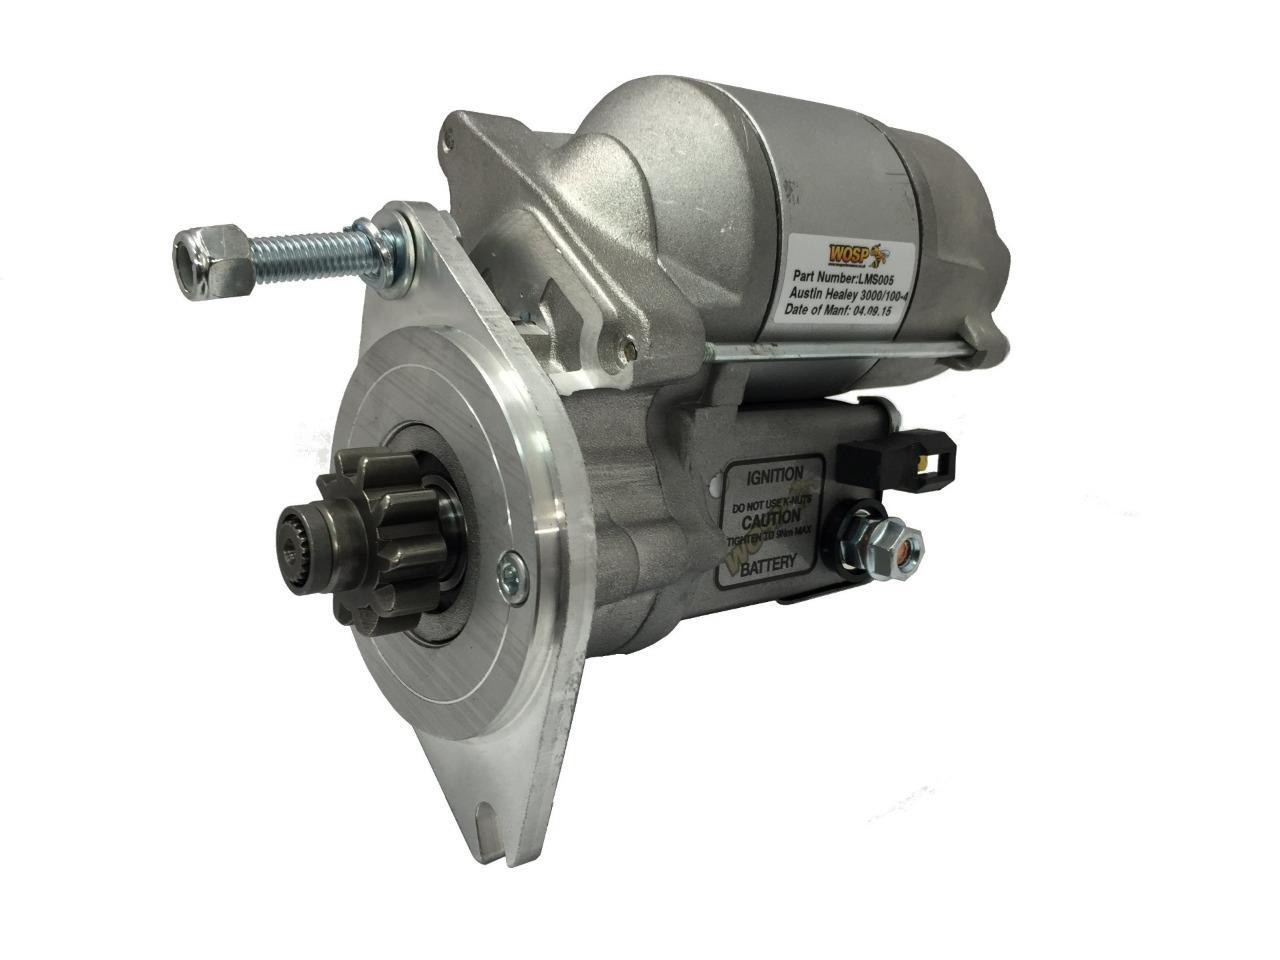 Austin Healey 100 4 3000 High Performance Starter Motor 14 Bj8 Wiring Diagram Motorsport Lms005